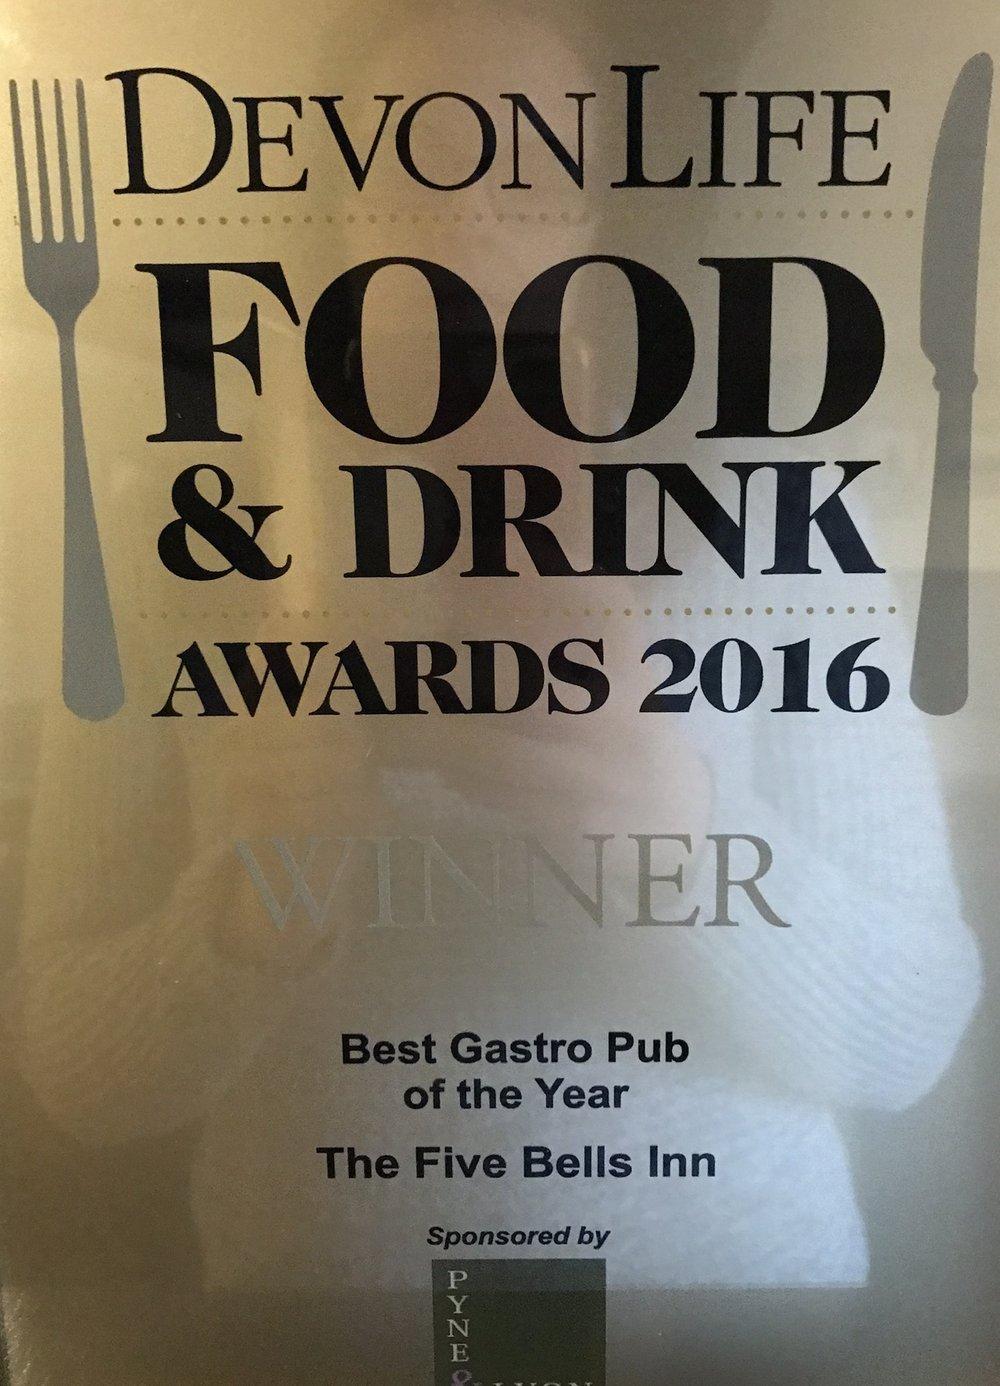 Devon Life Food & Drink Awards 2016 Best Gastro Pub of the Year